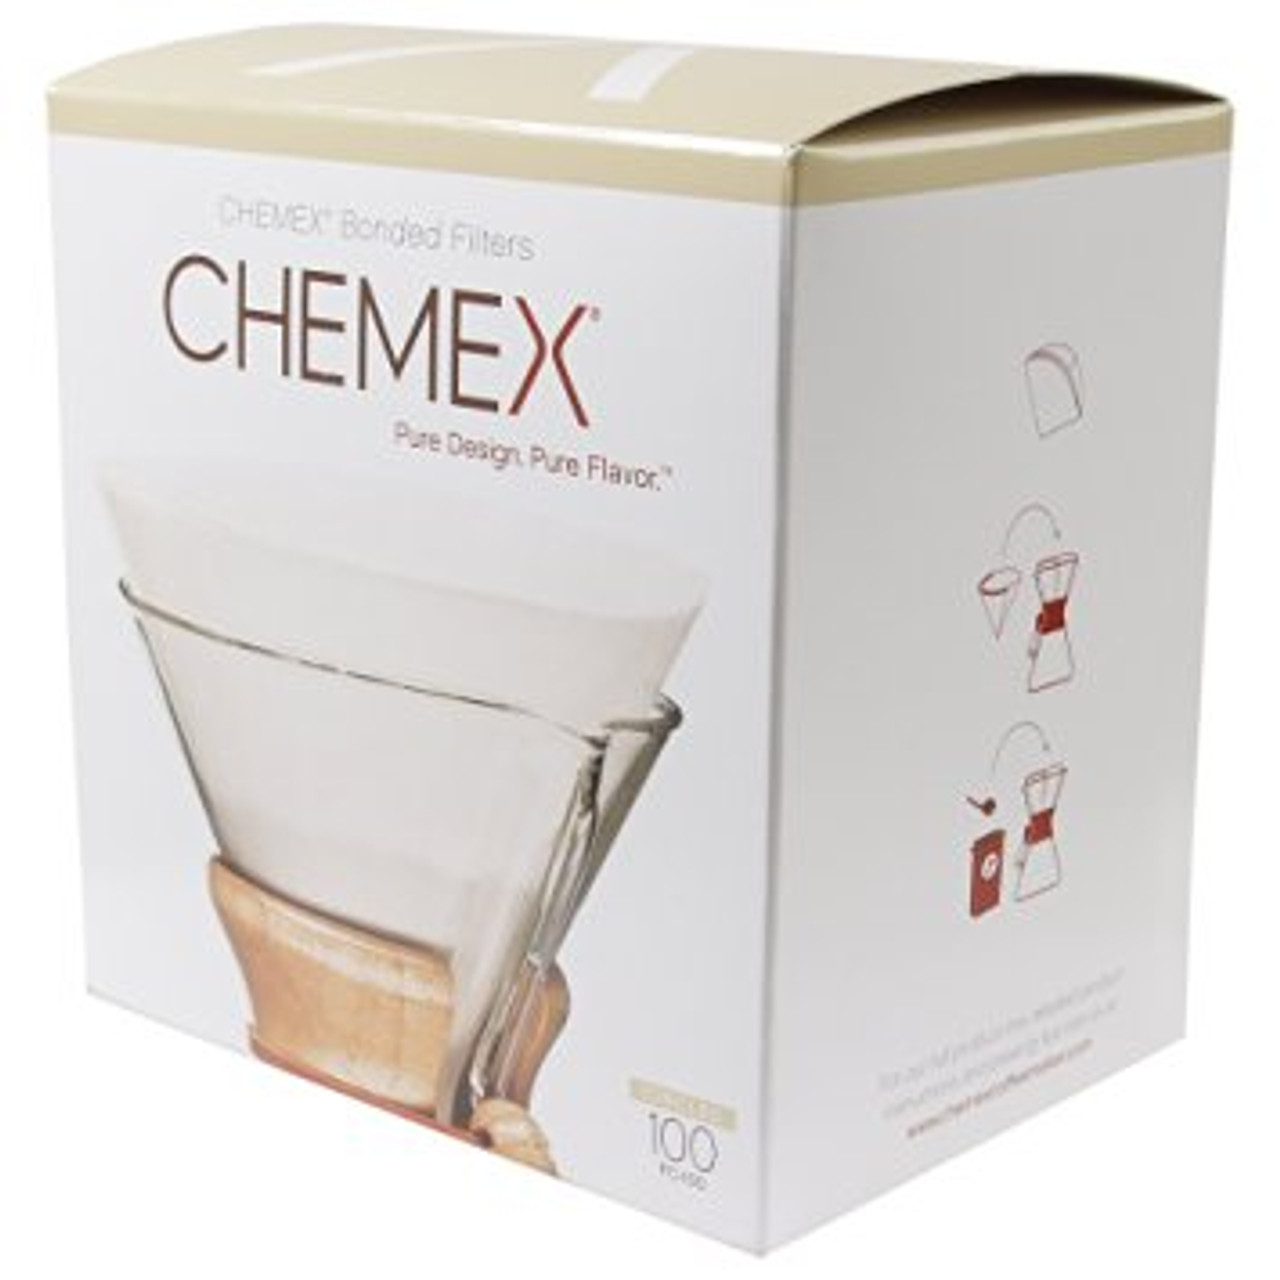 Chemex Filters - Prefolded Circles